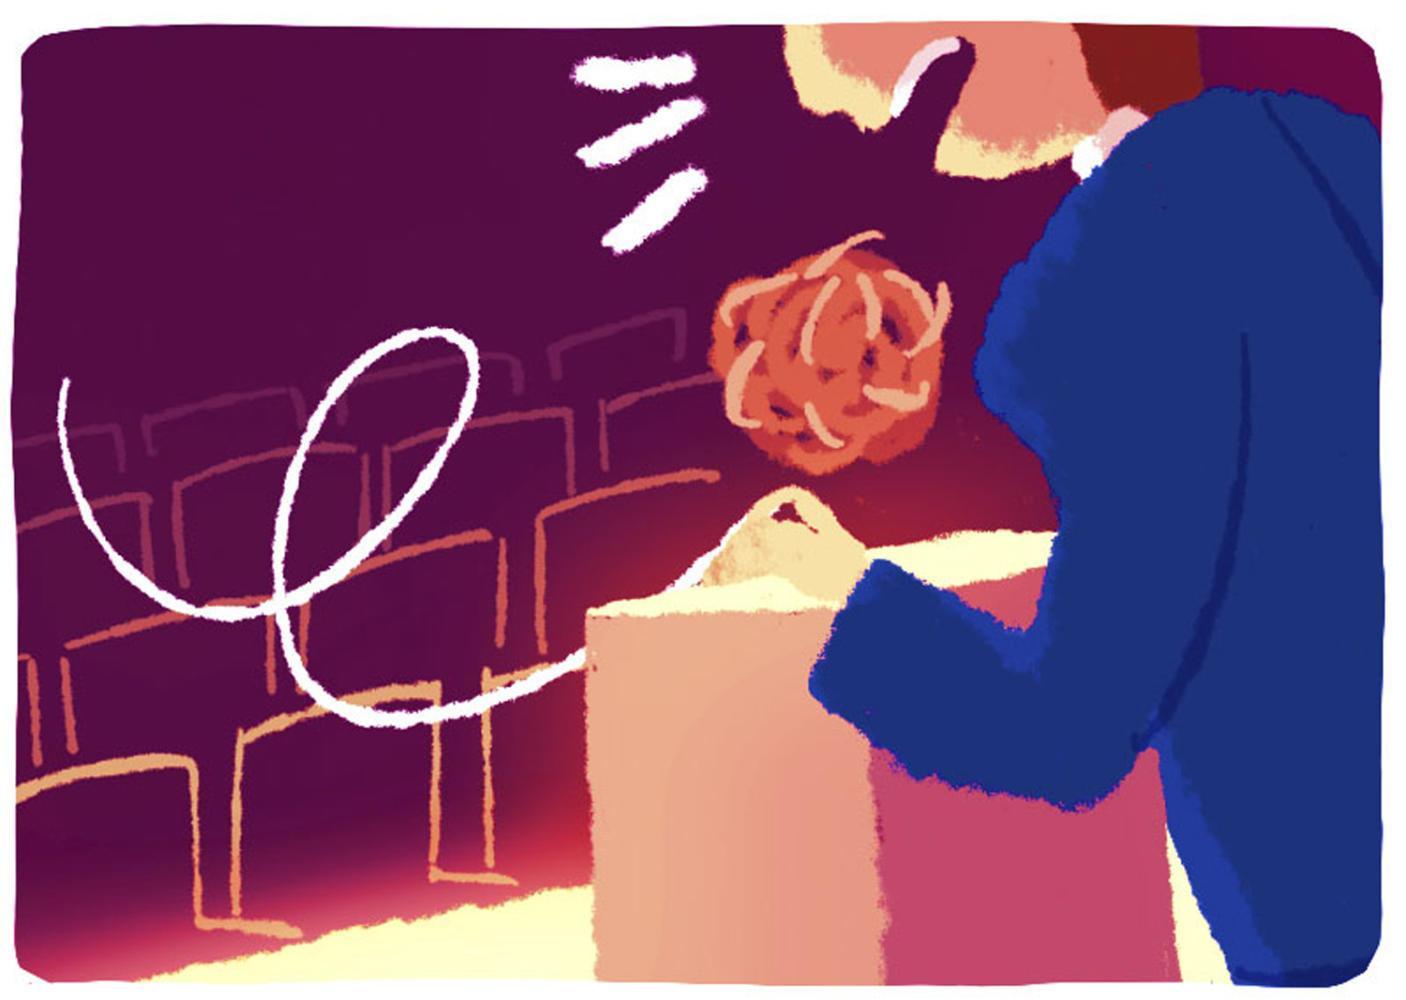 (Illustration by Raka Sakar | Staff Illustrator)